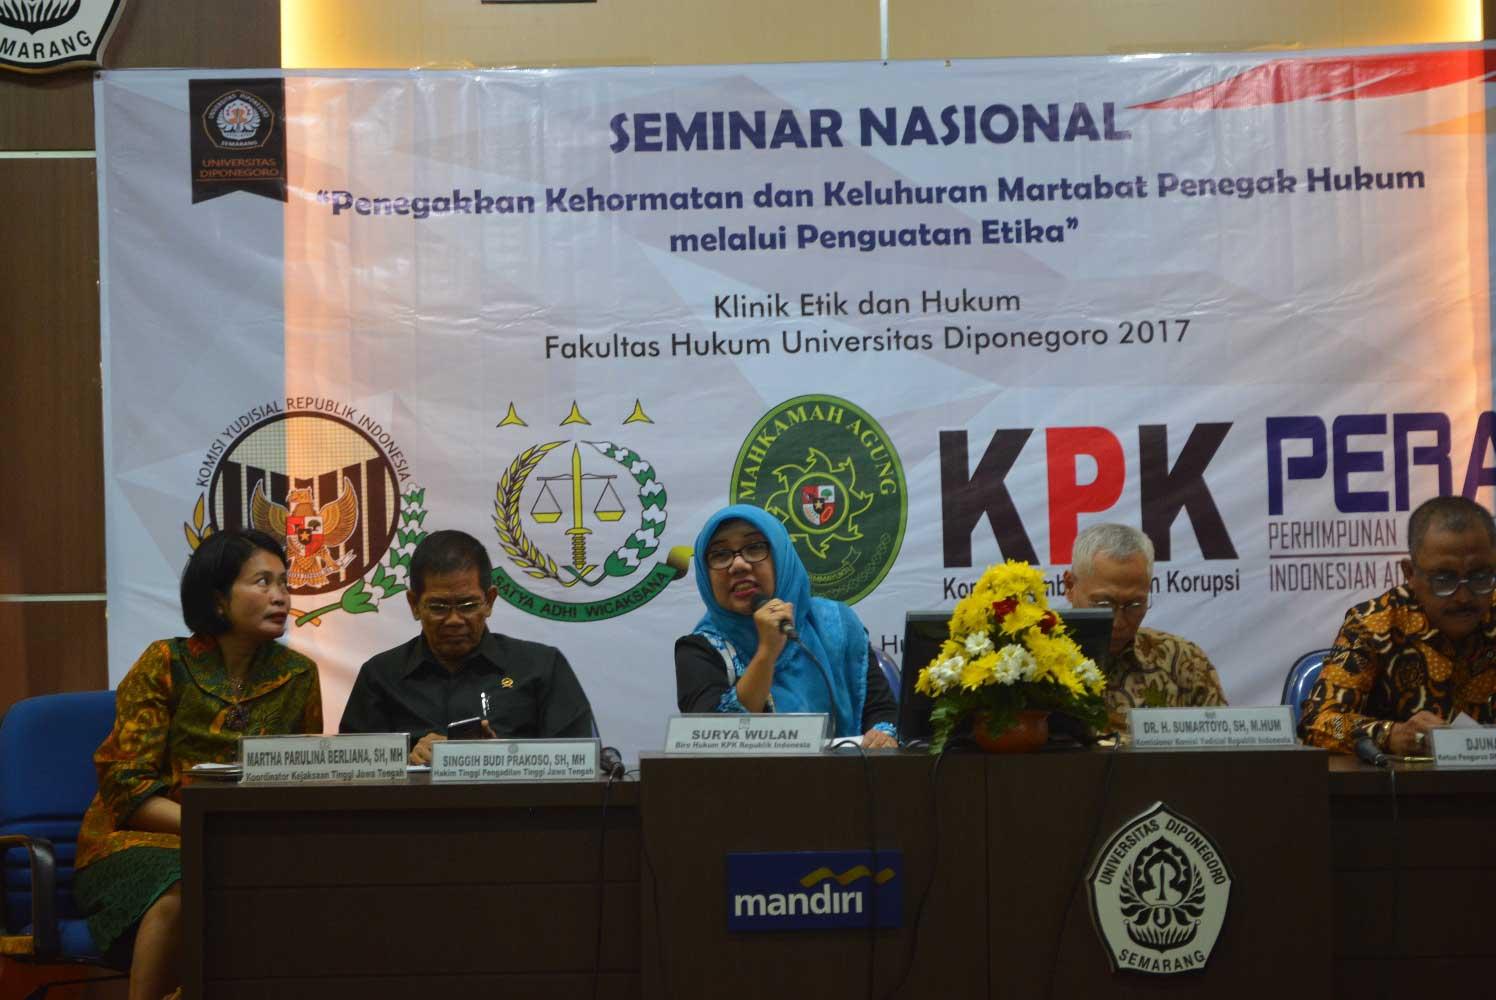 seminar-nasional-kpk